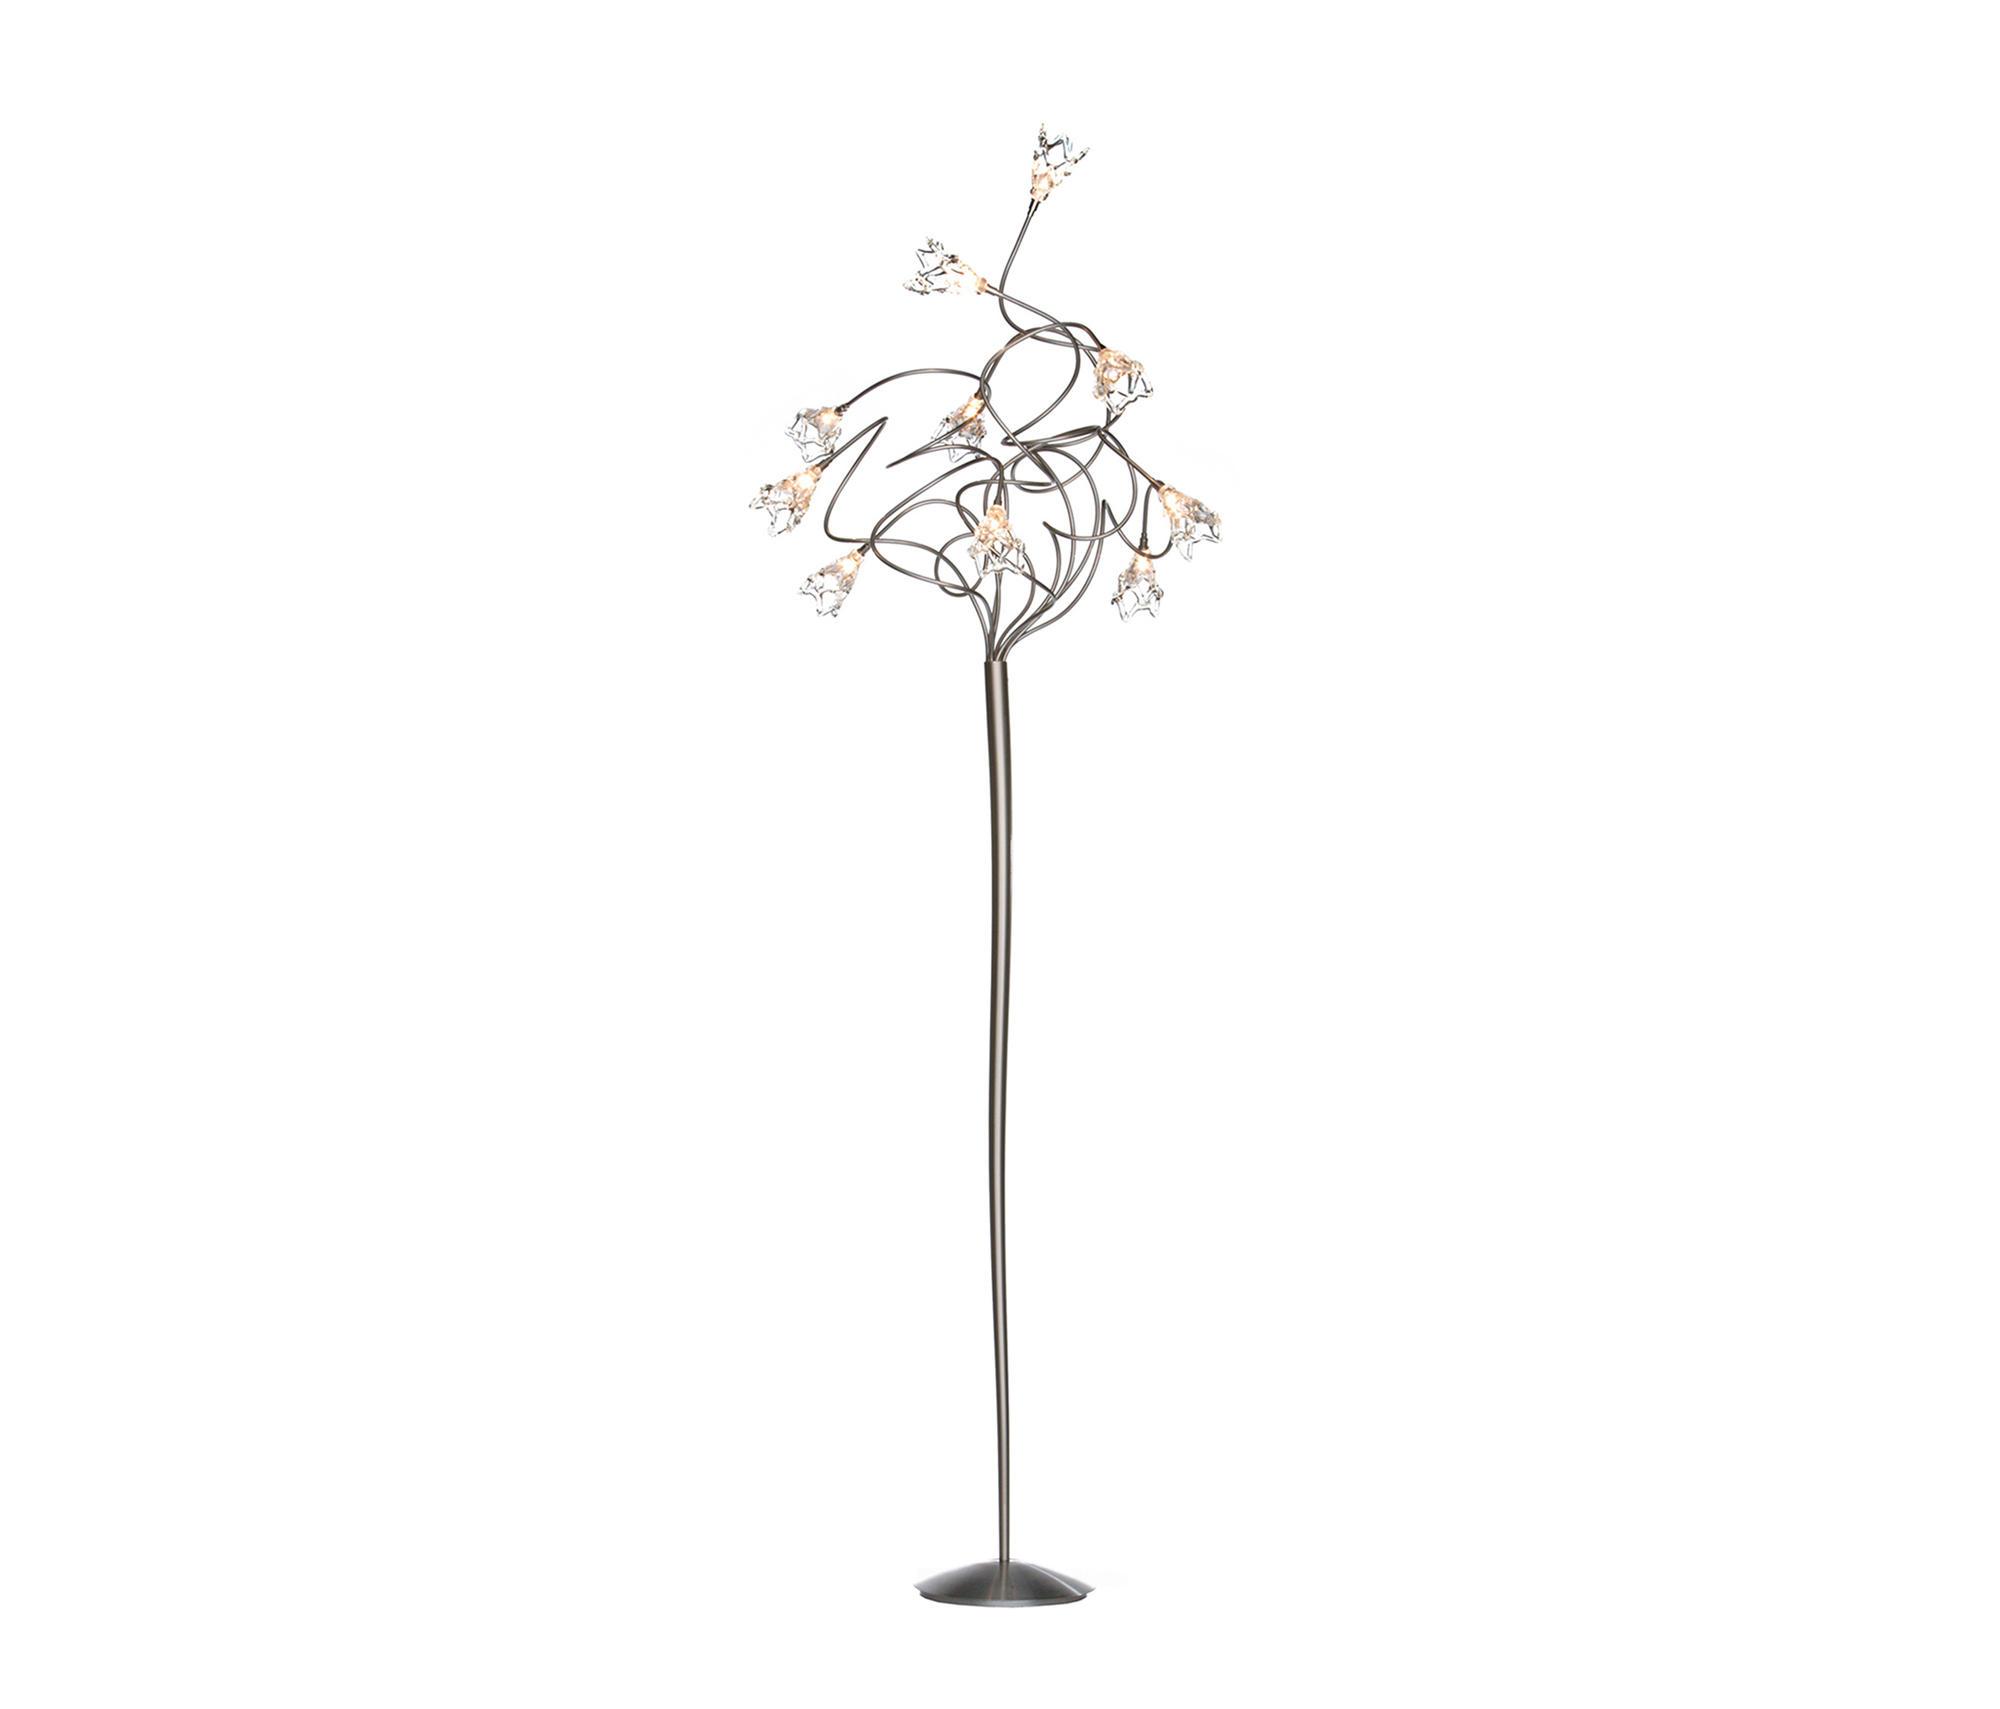 FLOOR LAMPS IN STAINLESS STEEL High quality designer FLOOR LAMPS